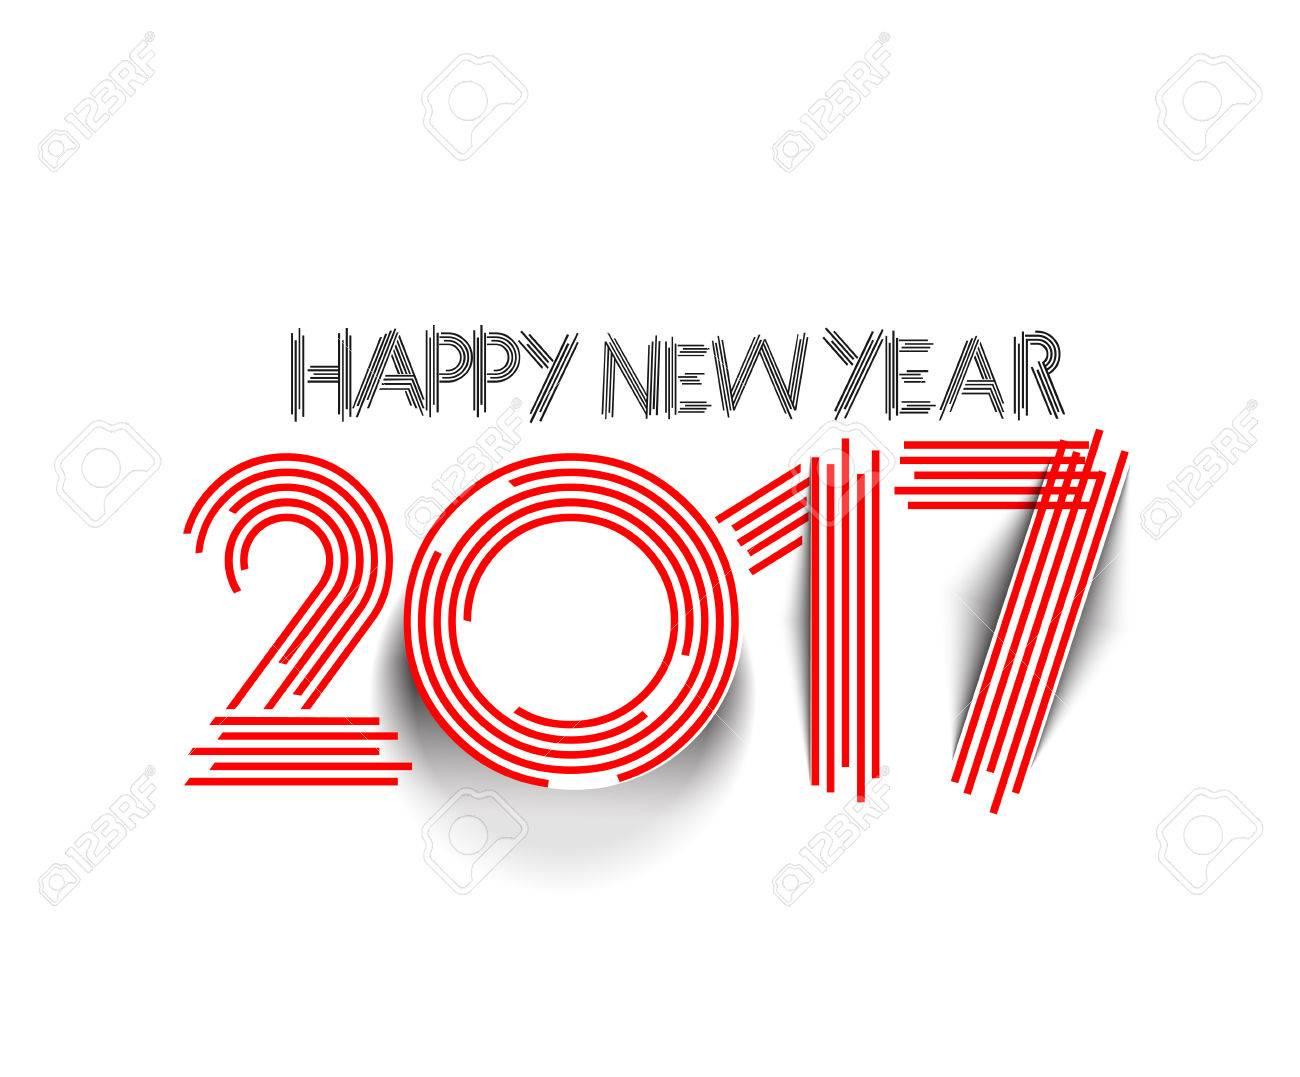 Happy new year 2017 Text Design vector - 60561151